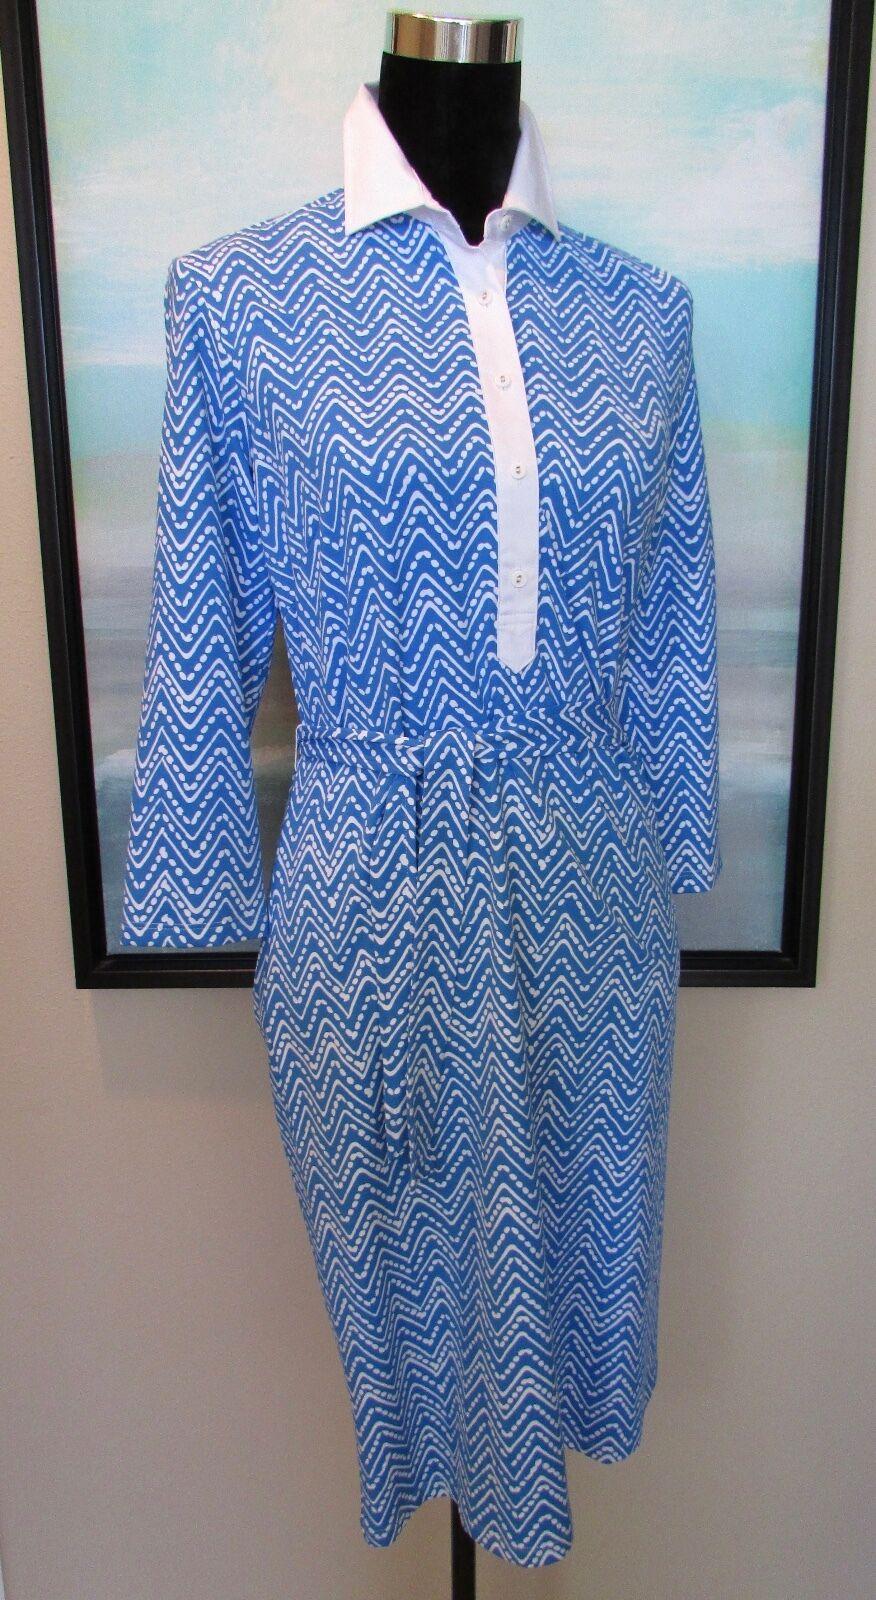 J. McLaughlin Blau Chevron Belted Sheath Dress Catalina Cloth Sz S